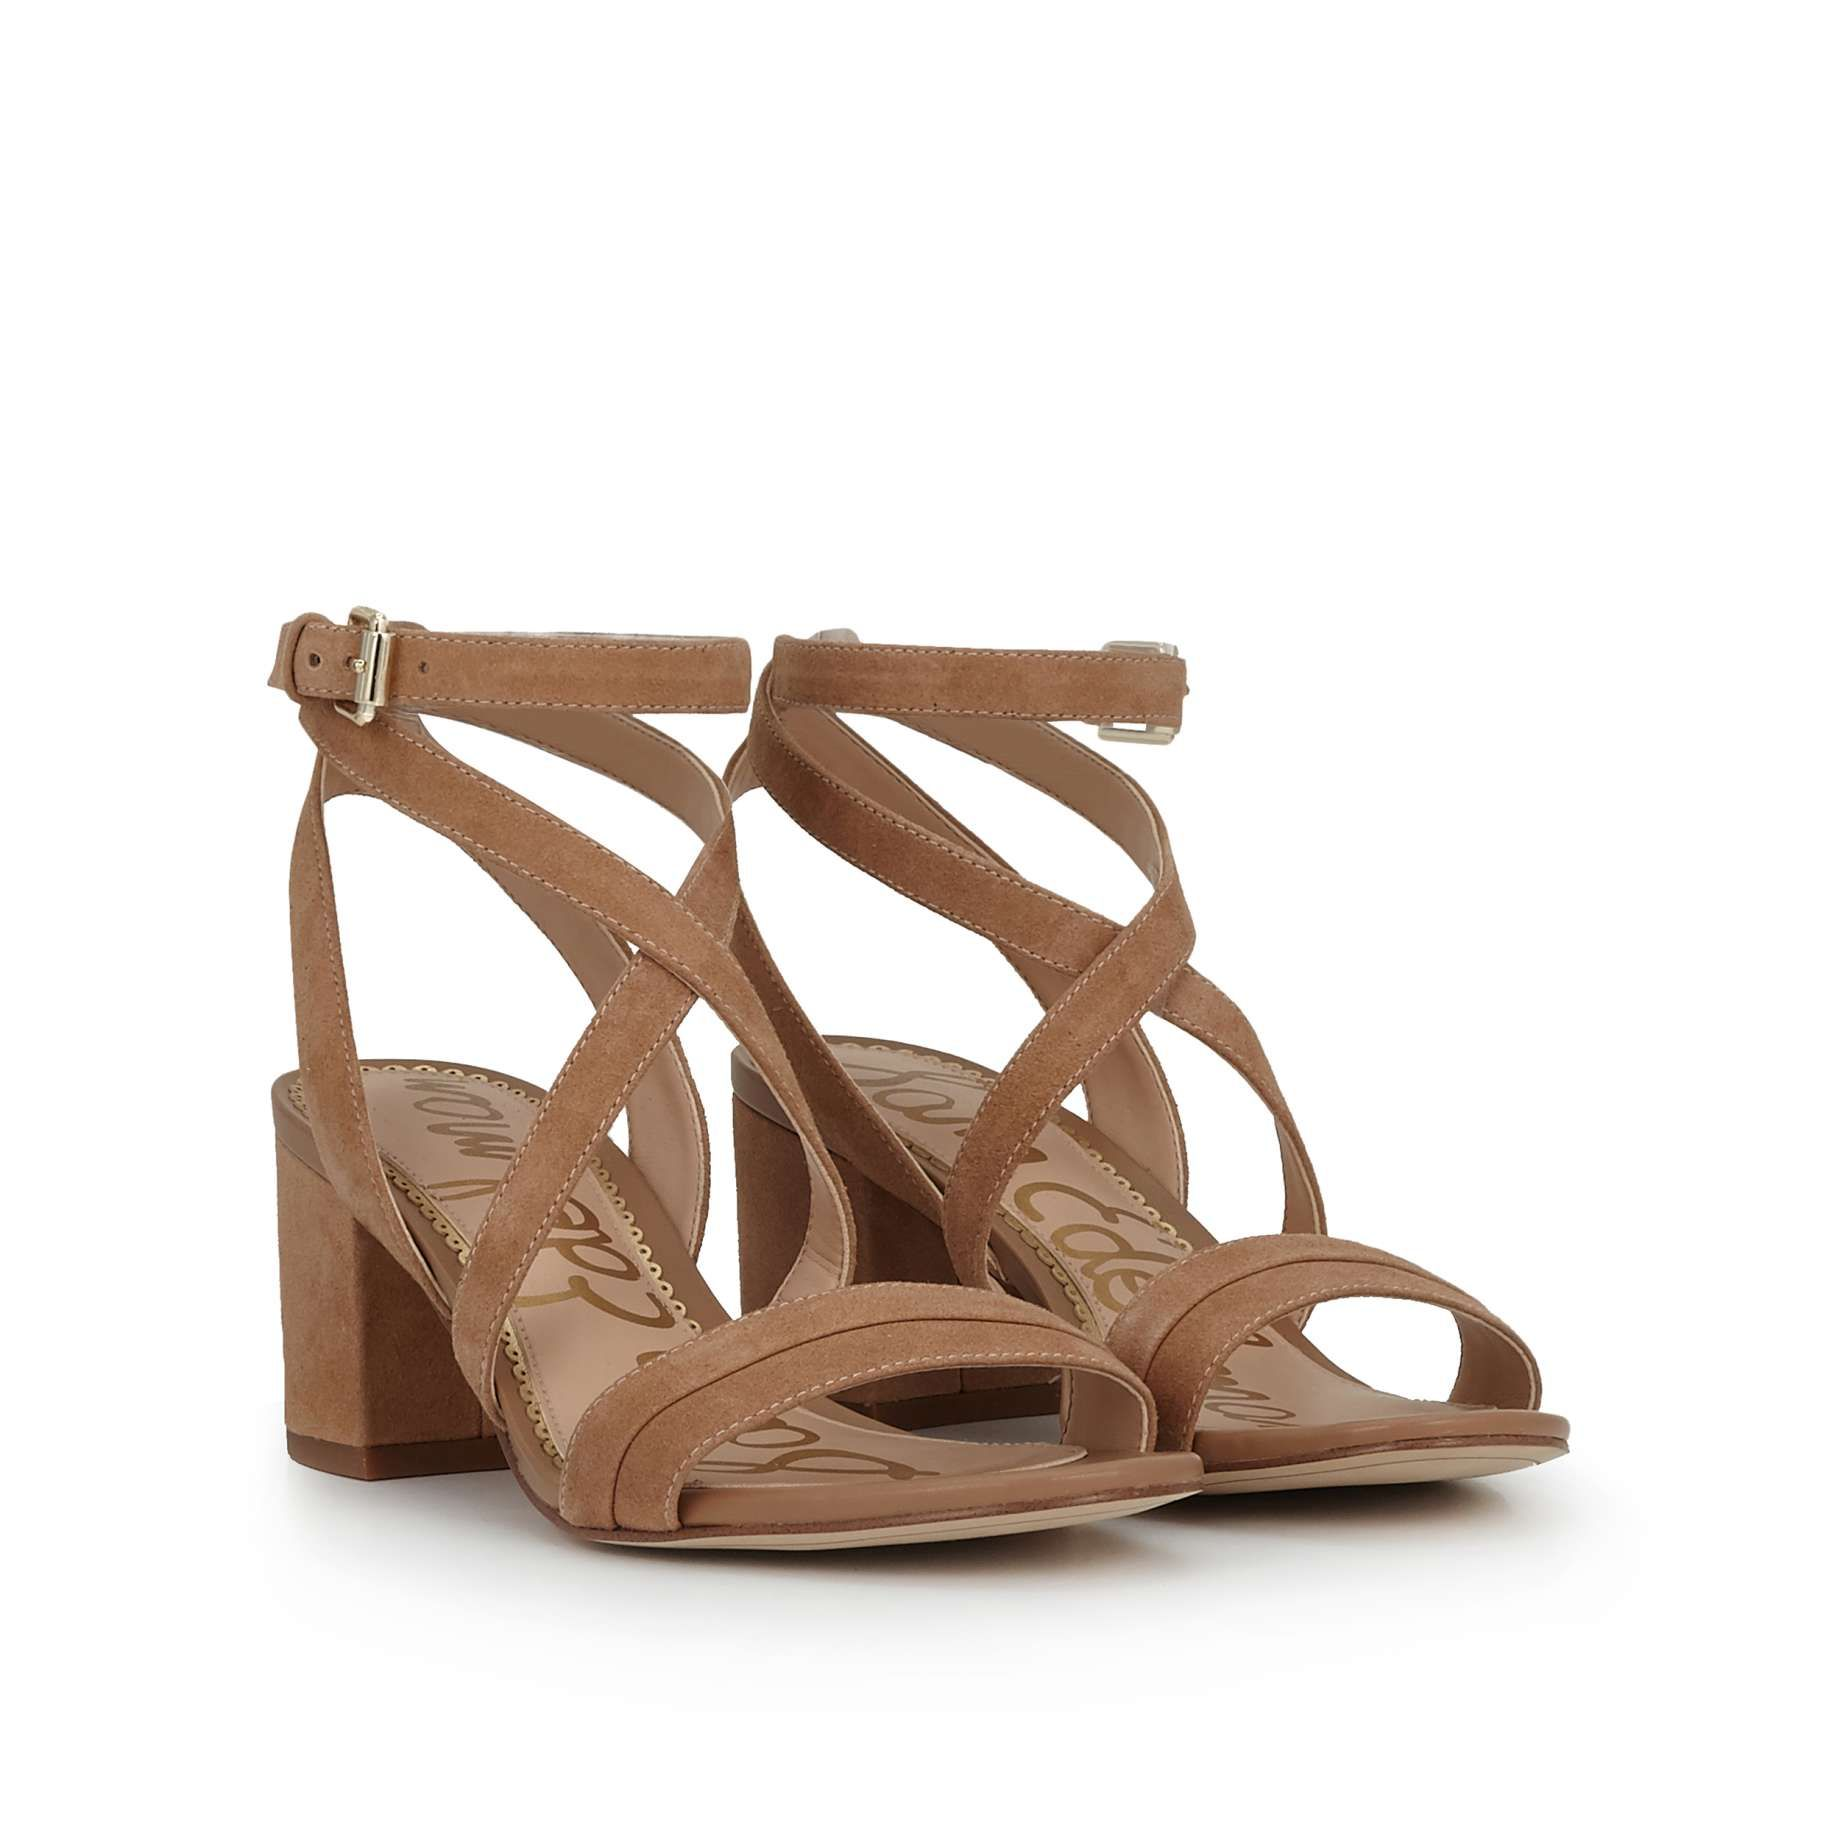 36a4a92ad67 Sammy Block Heel Sandal by Sam Edelman - Camel Suede - View 1